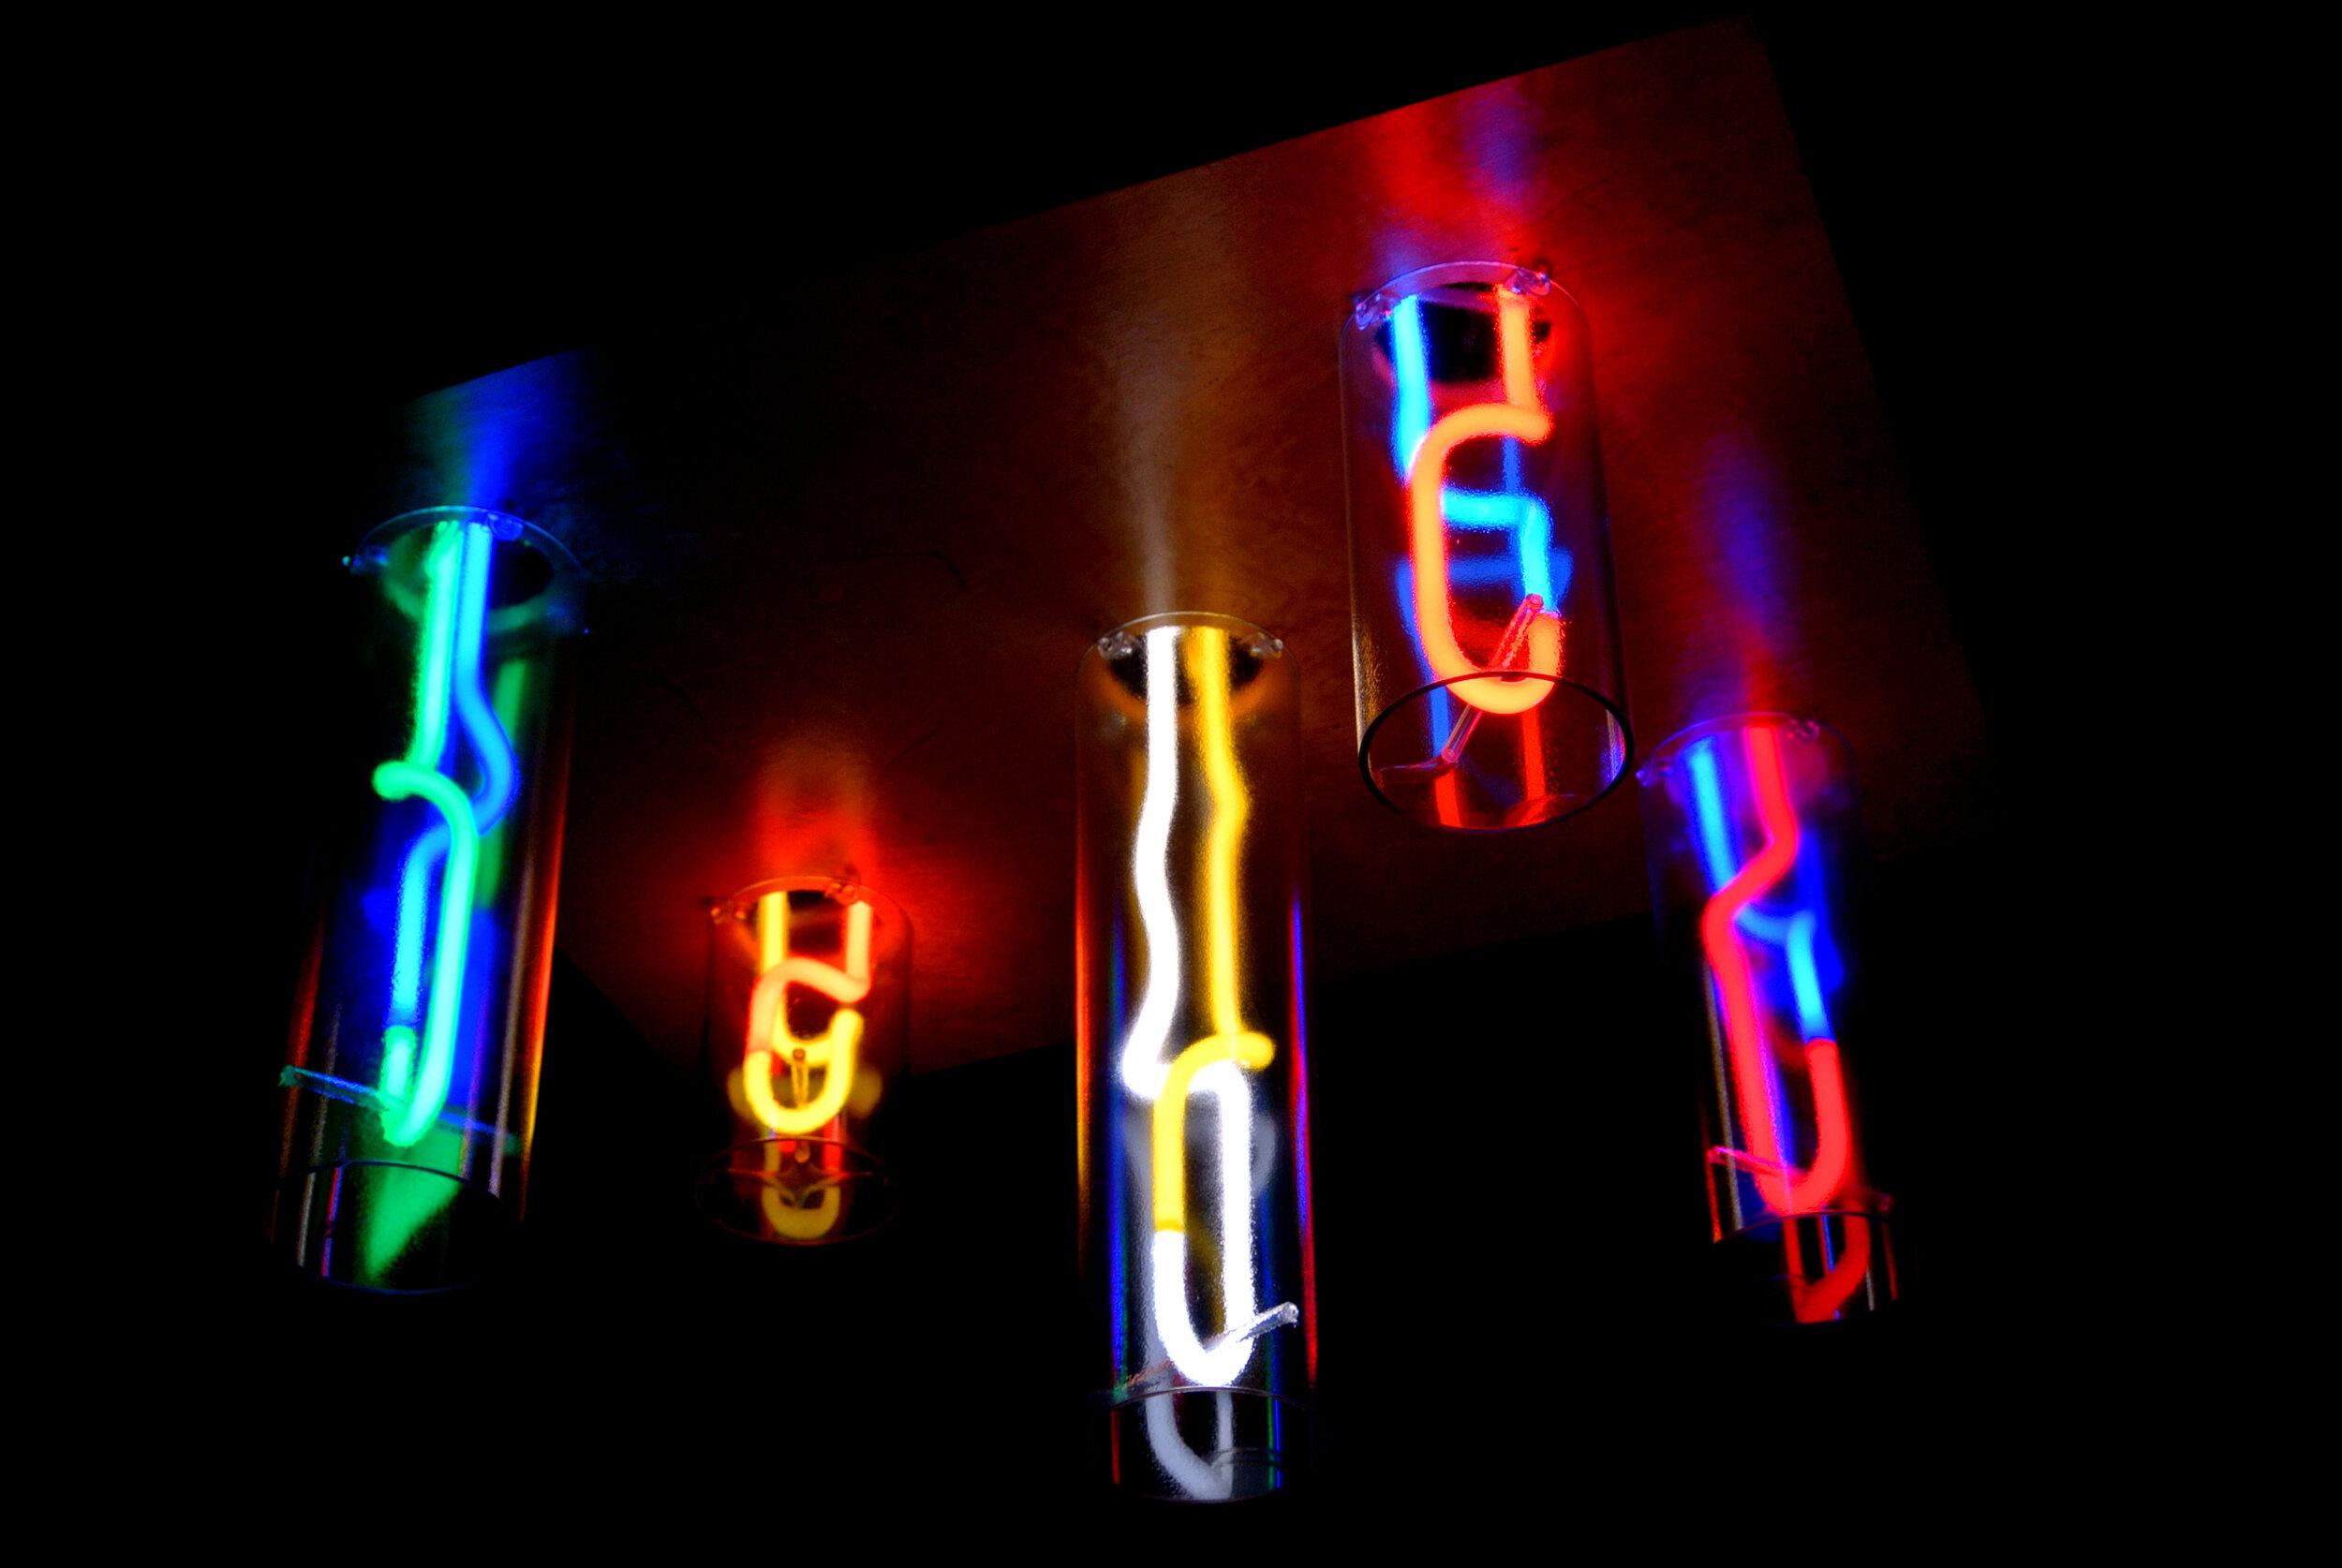 Italian Cave Icicles Designer Neon Chandelier by John Barton - BartonNeonMagic.com